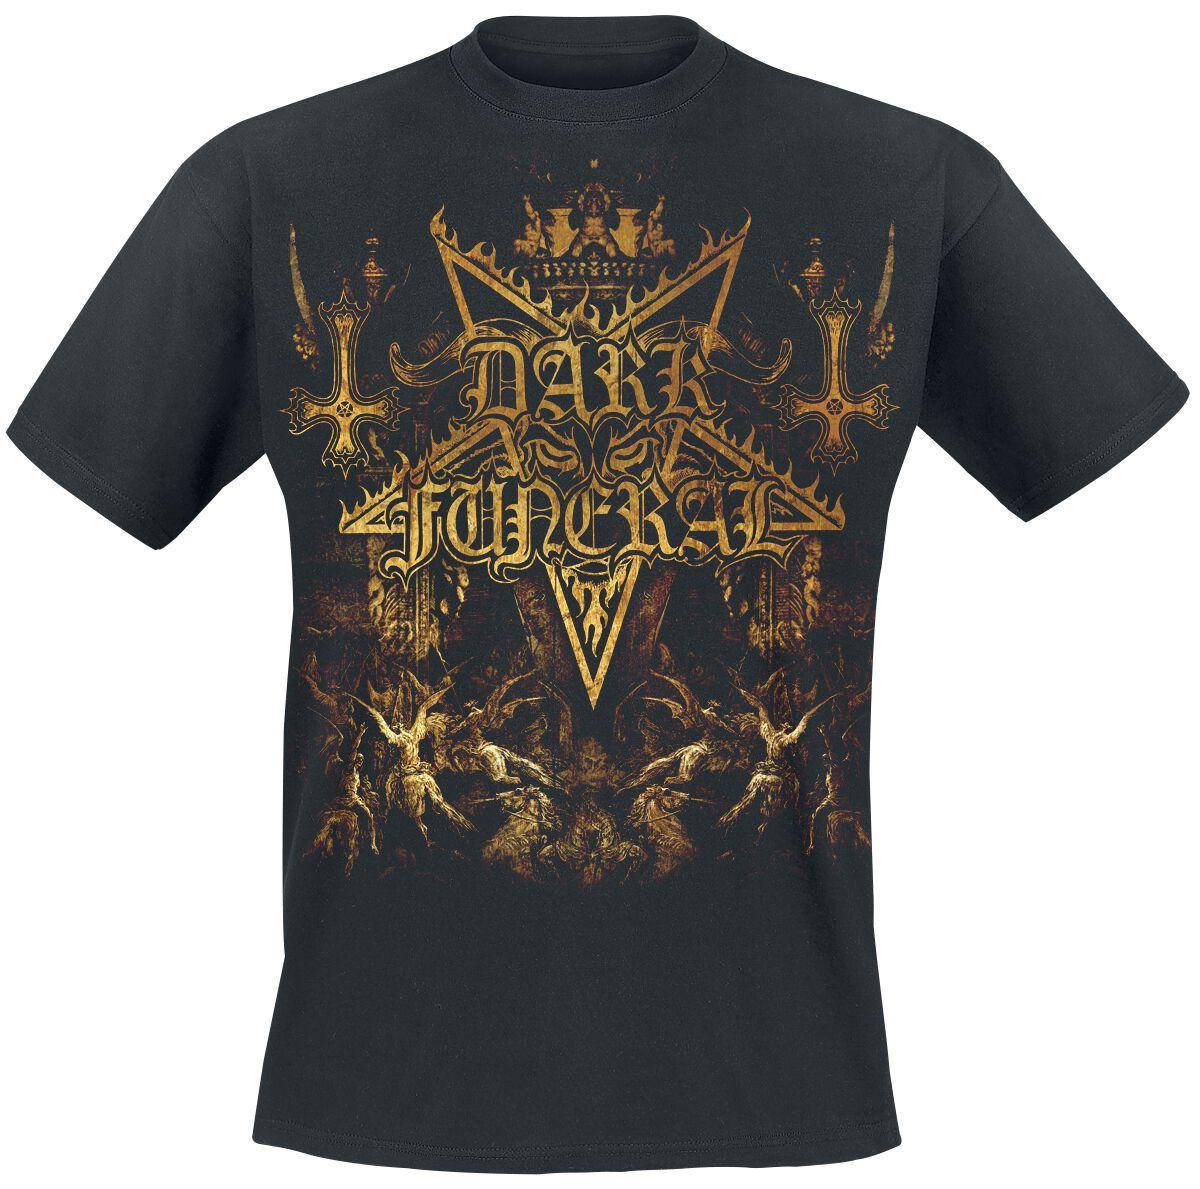 Zespoły - Koszulki - T-Shirt Dark Funeral The Ineffable Kings T-Shirt czarny - 358806